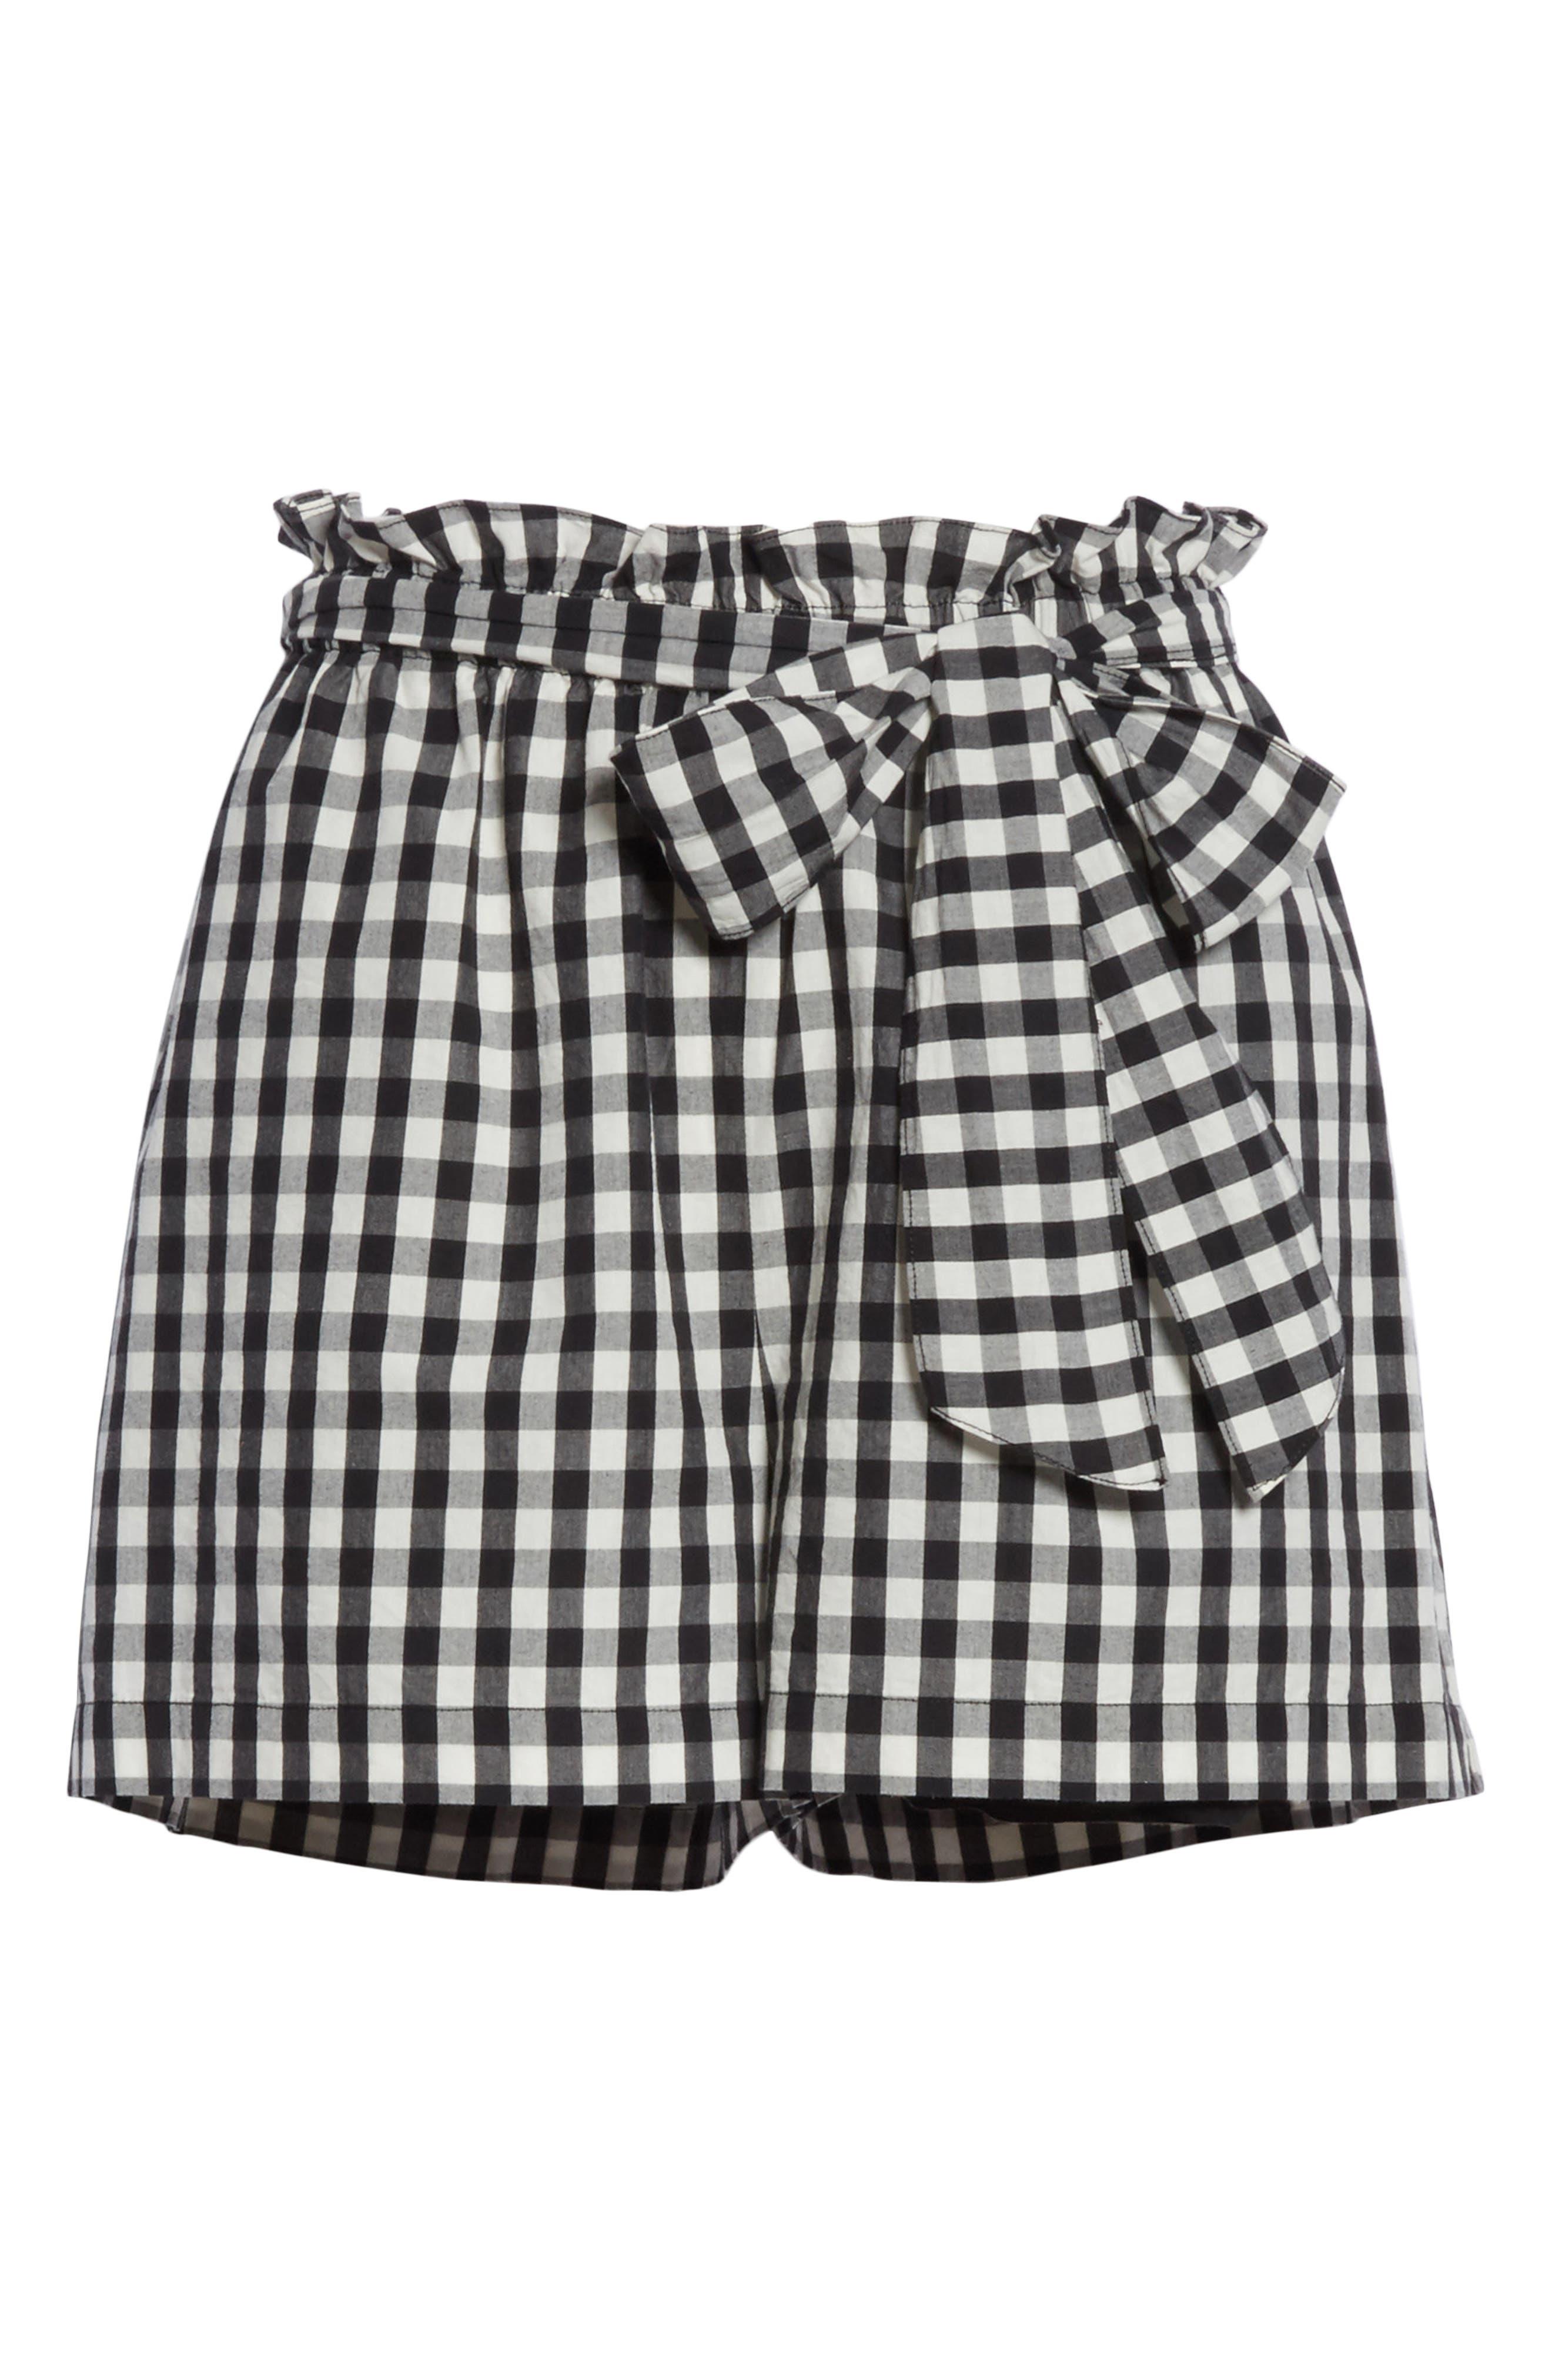 Cleantha Gingham Cotton Shorts,                             Alternate thumbnail 6, color,                             Caviar